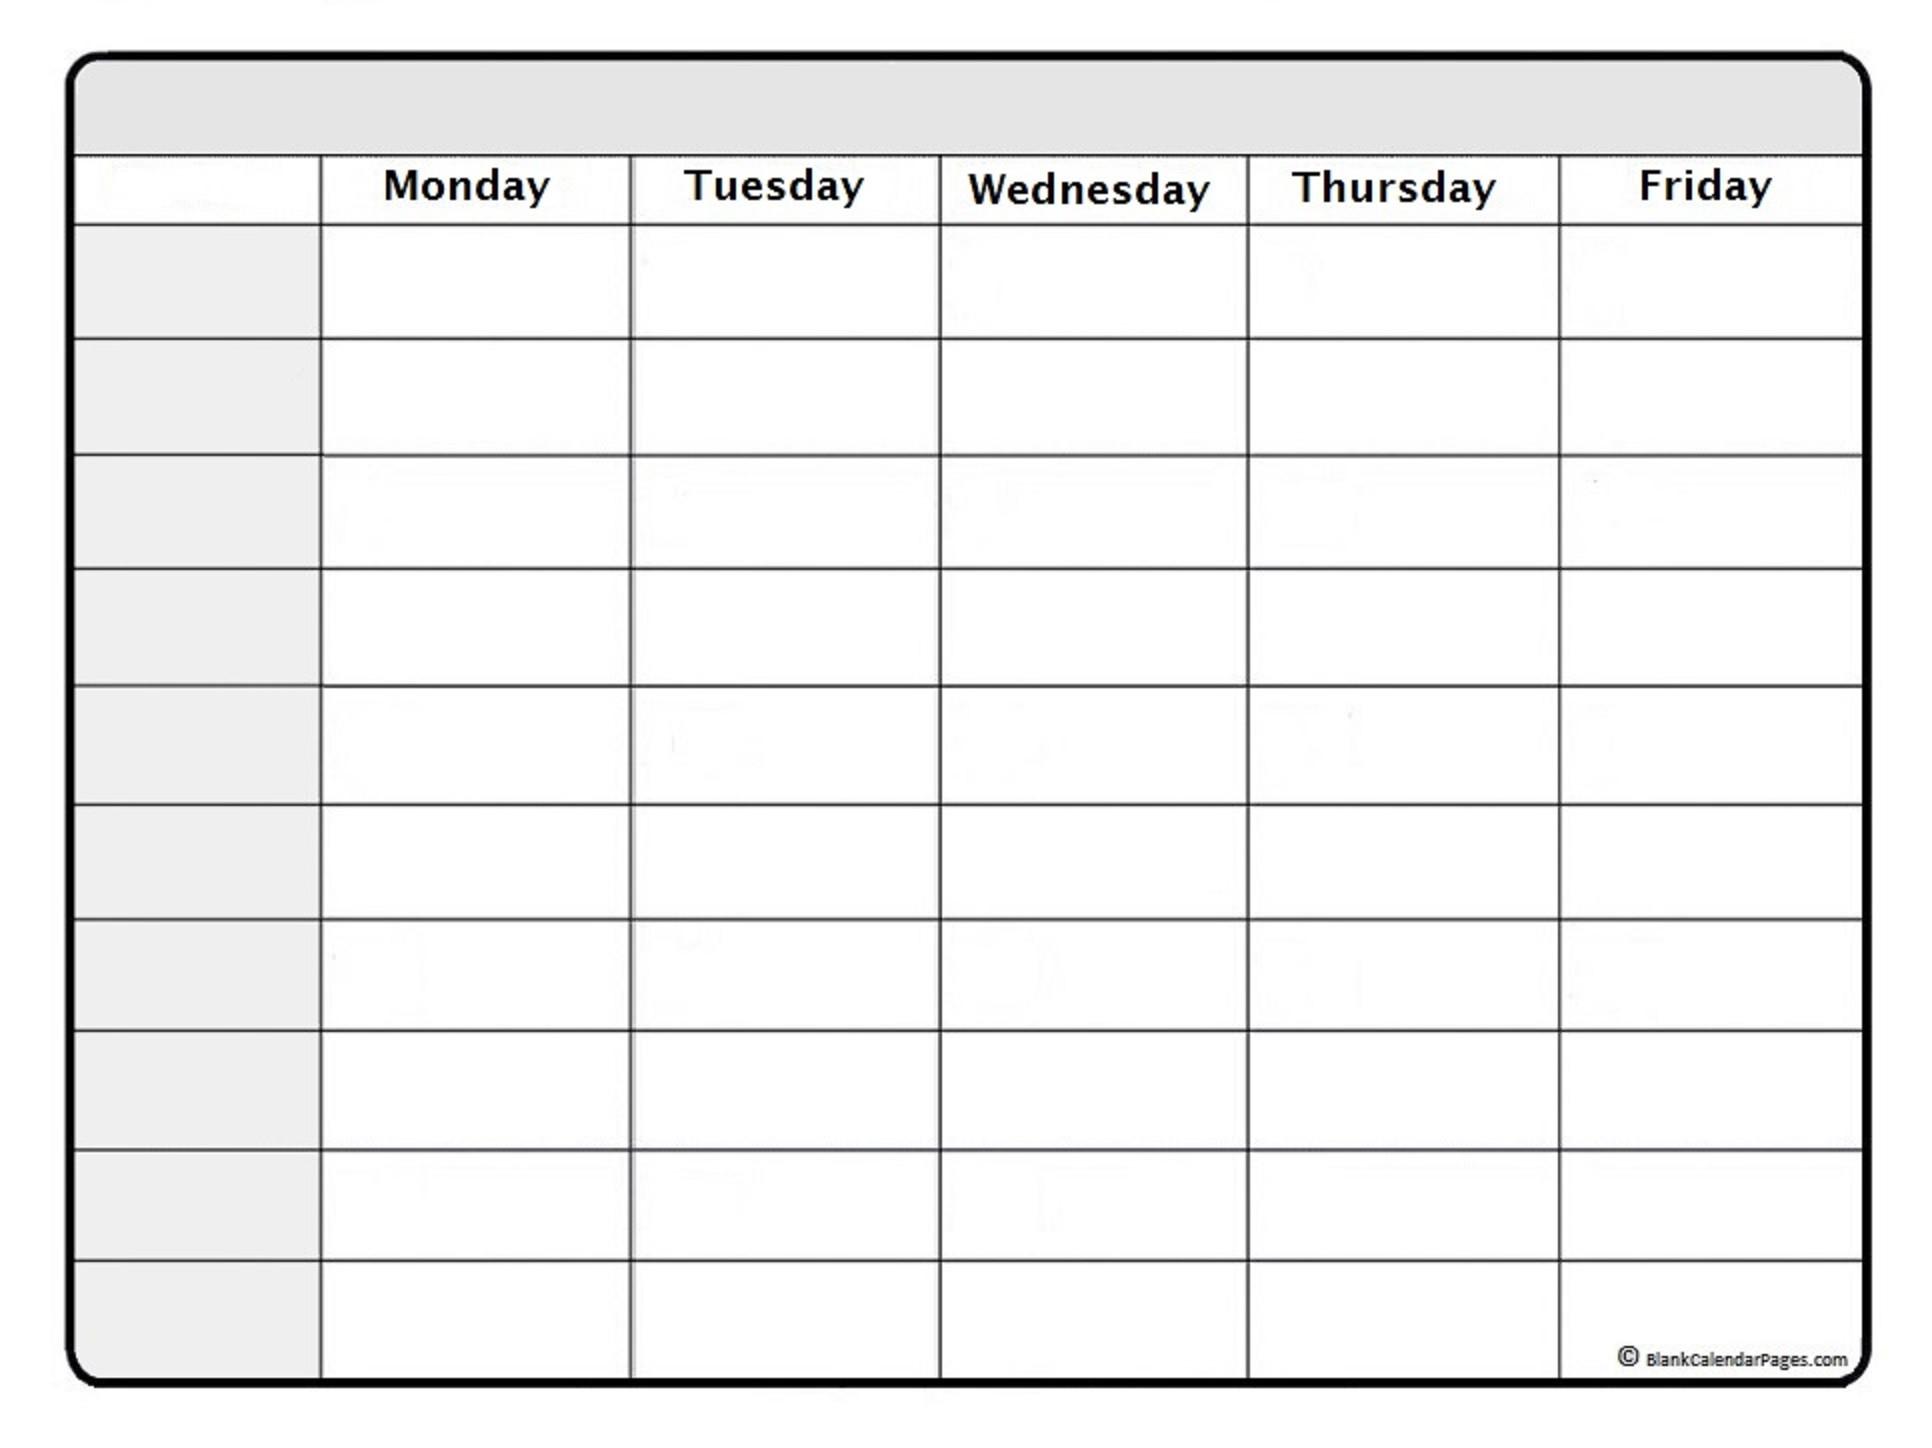 May 2021 Weekly Calendar   May 2021 Weekly Calendar Template-Free Printable Hourly Calendar 2021